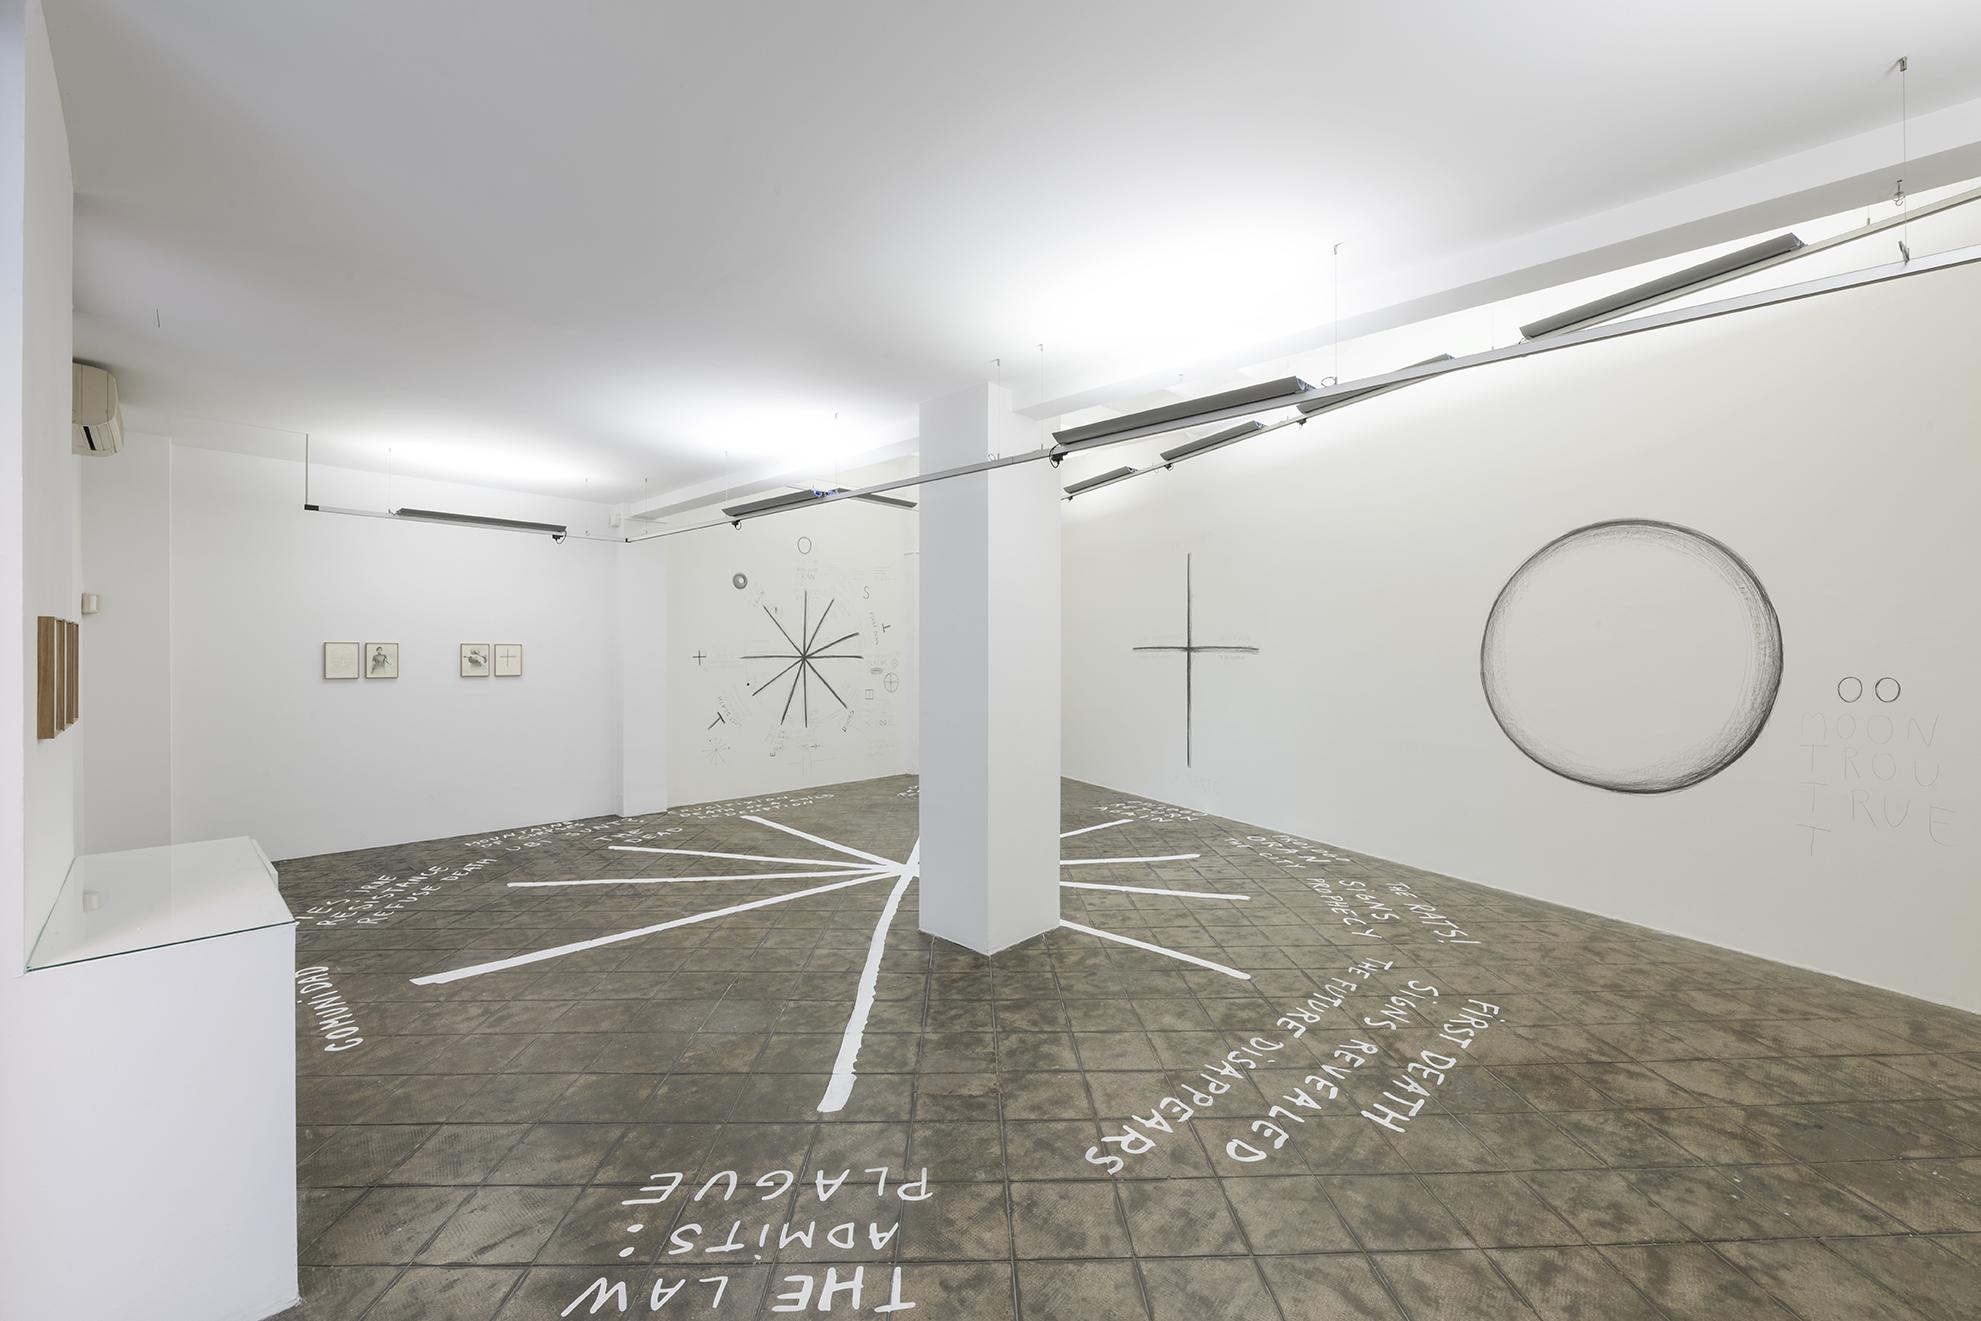 Installation view: La Peste, ProjecteSD | La Peste (The Plague) | ProjecteSD